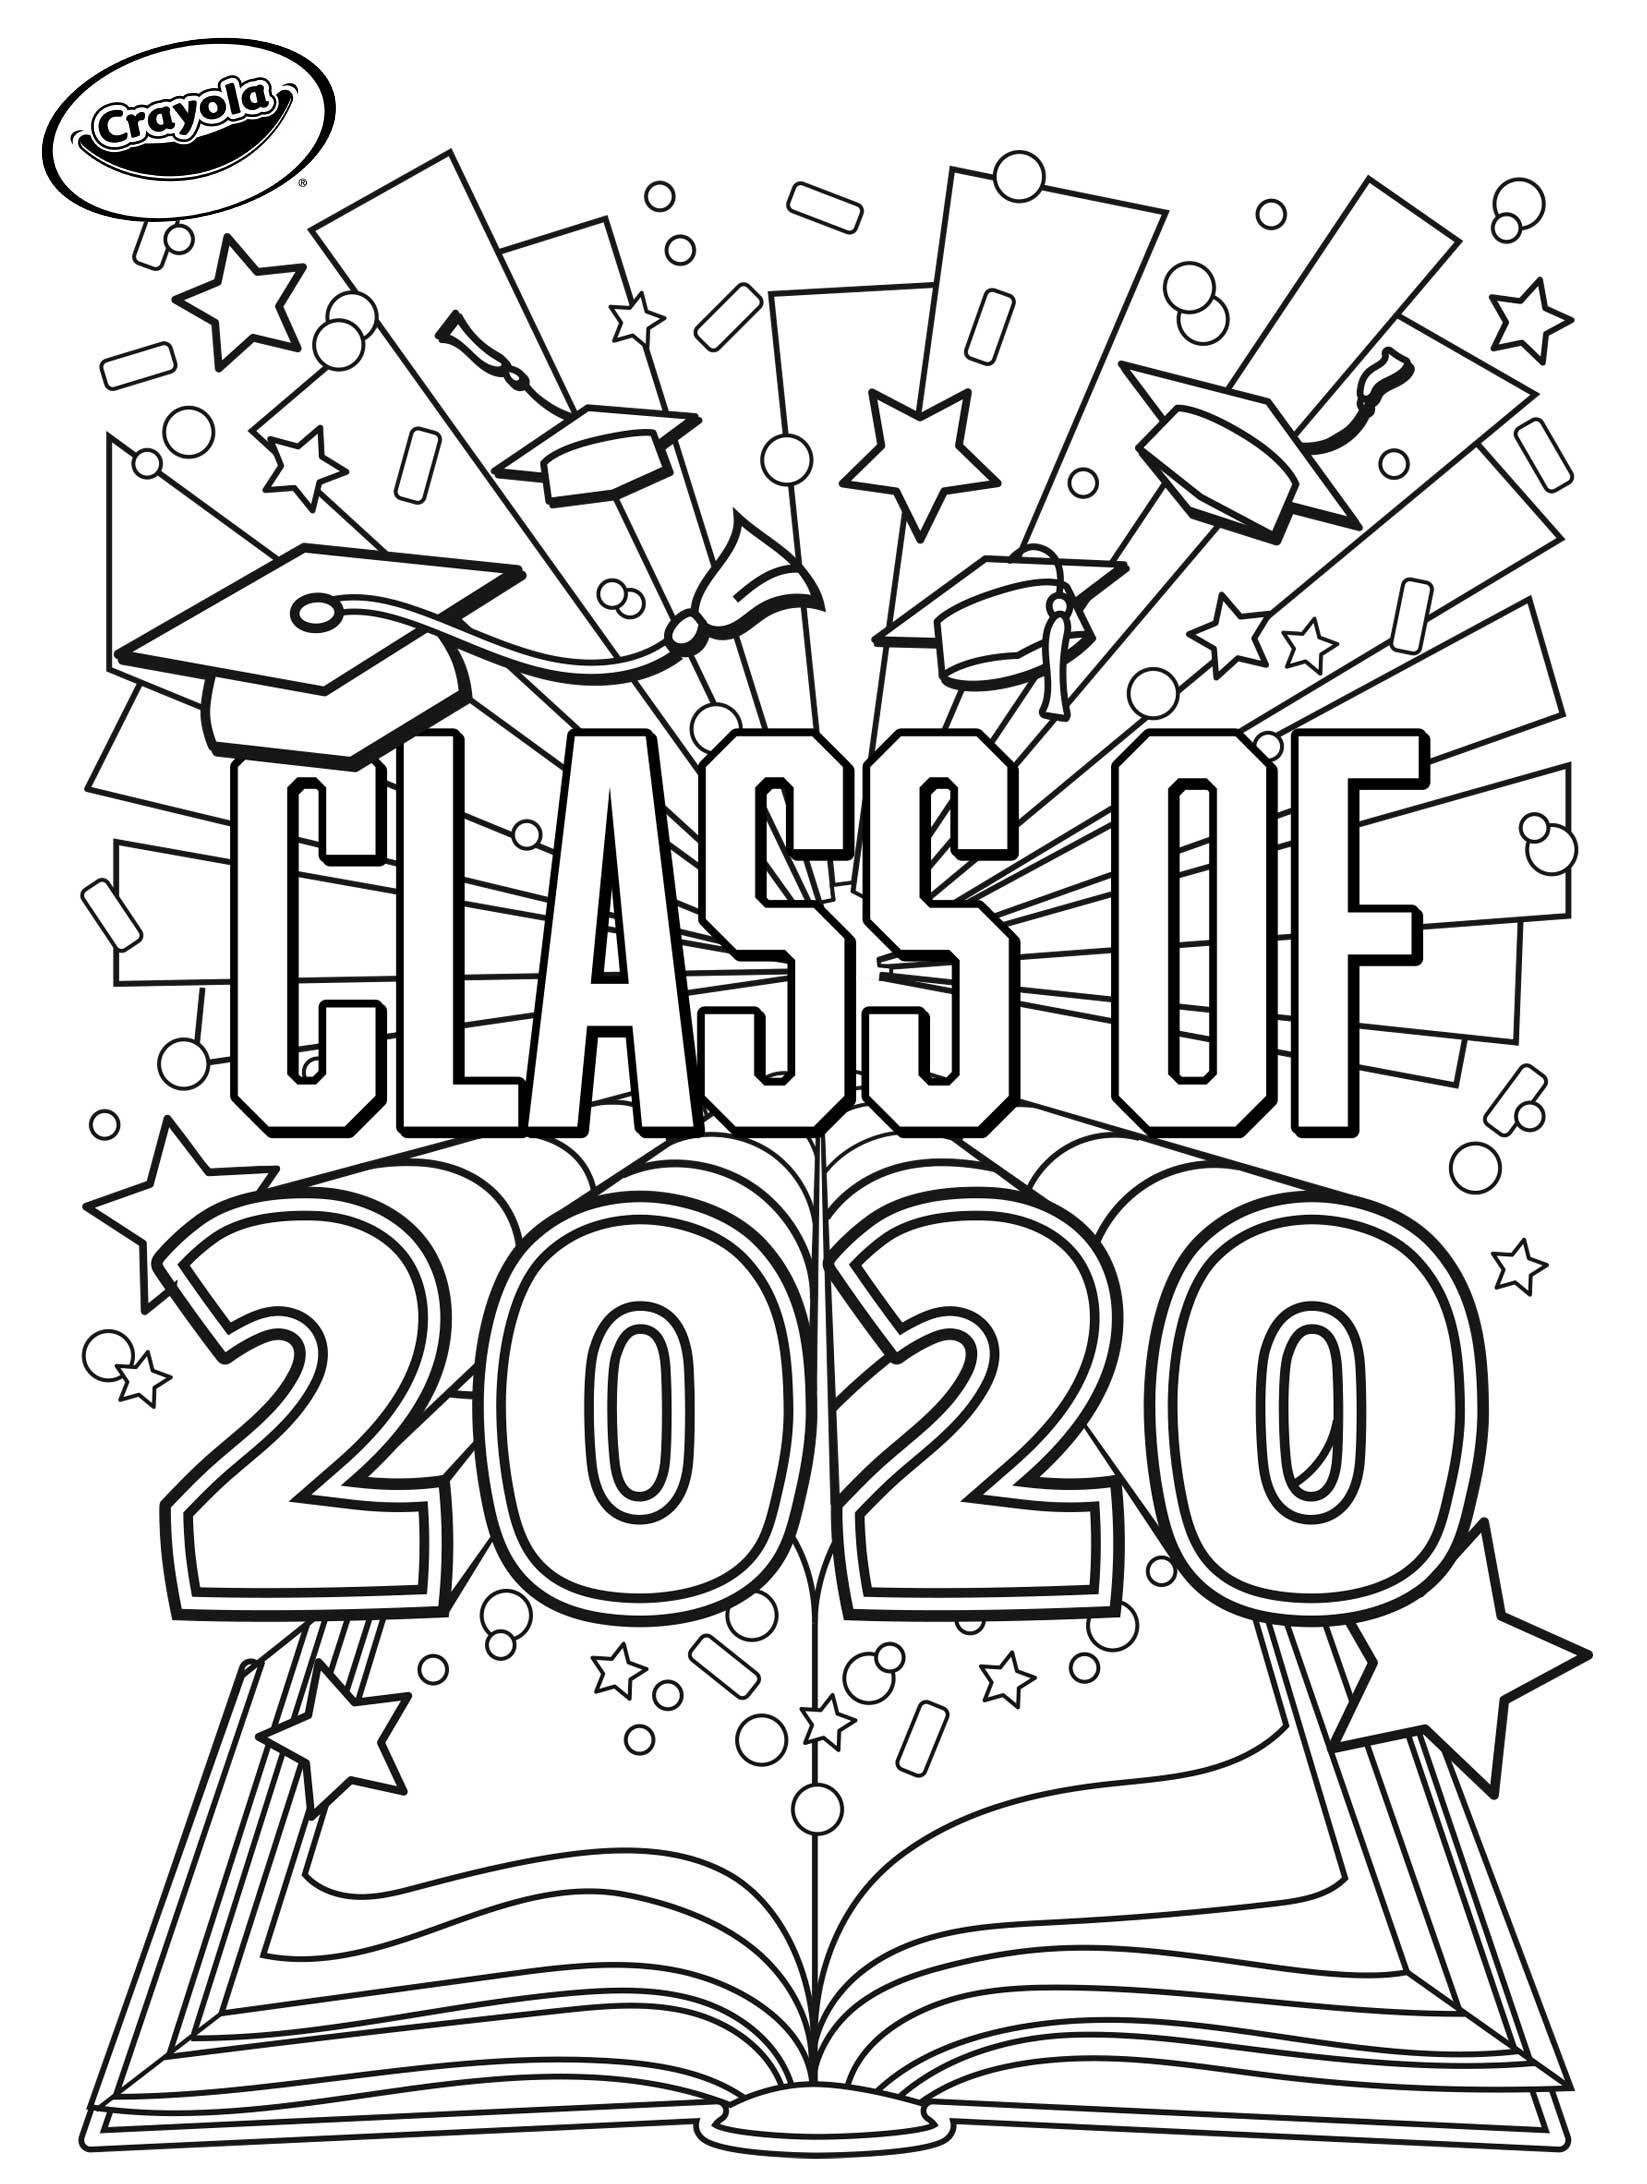 - Class Of 2020 Graduation Crayola.com